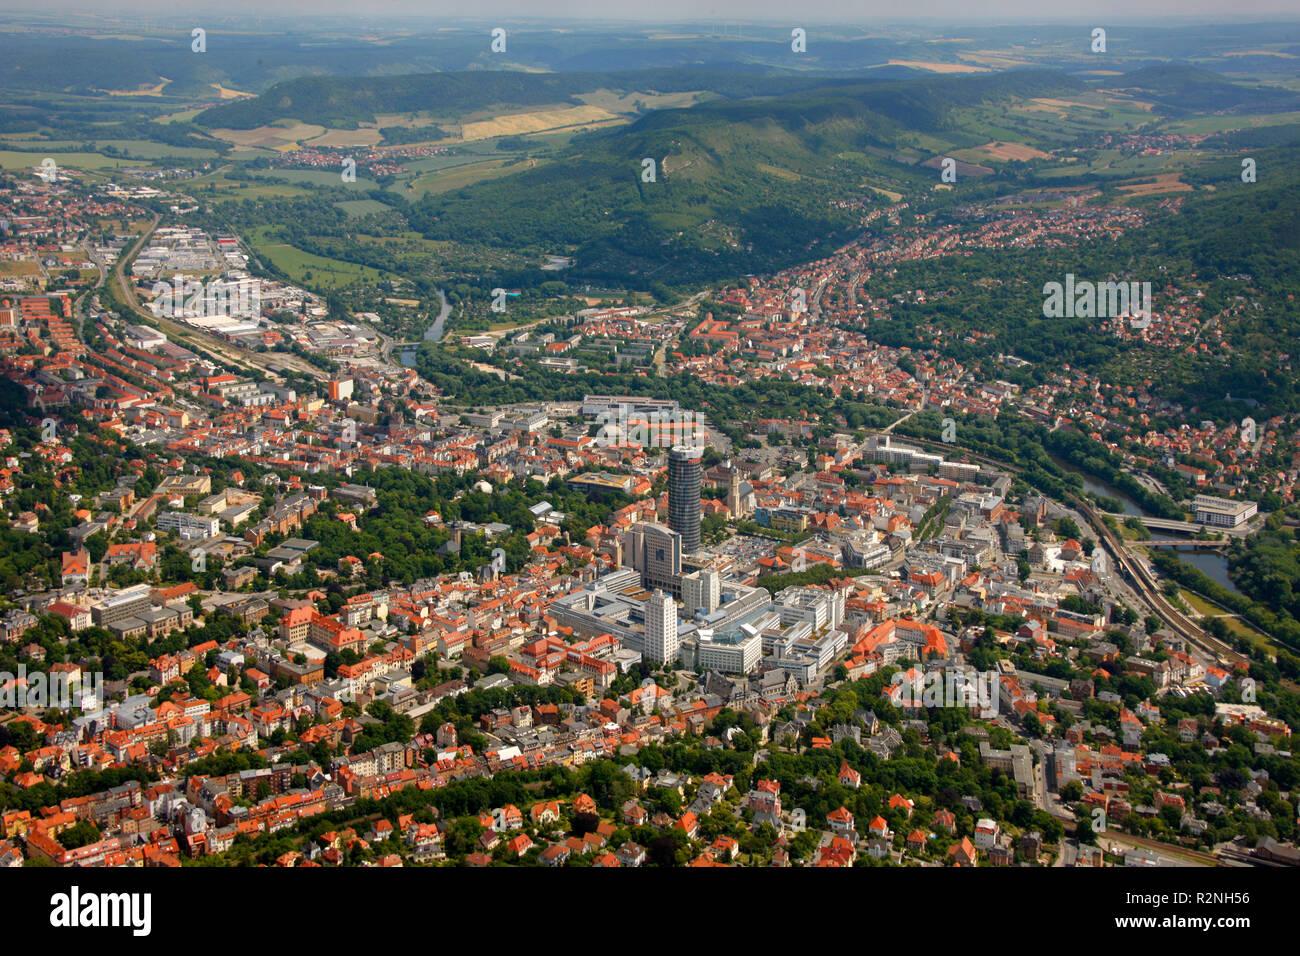 Aerial view, Jentower, Jenoptik, Stadtmitte, University of Jena, aerial view, Mädertal 6, Jena, Thuringia, Germany, Europe, - Stock Image